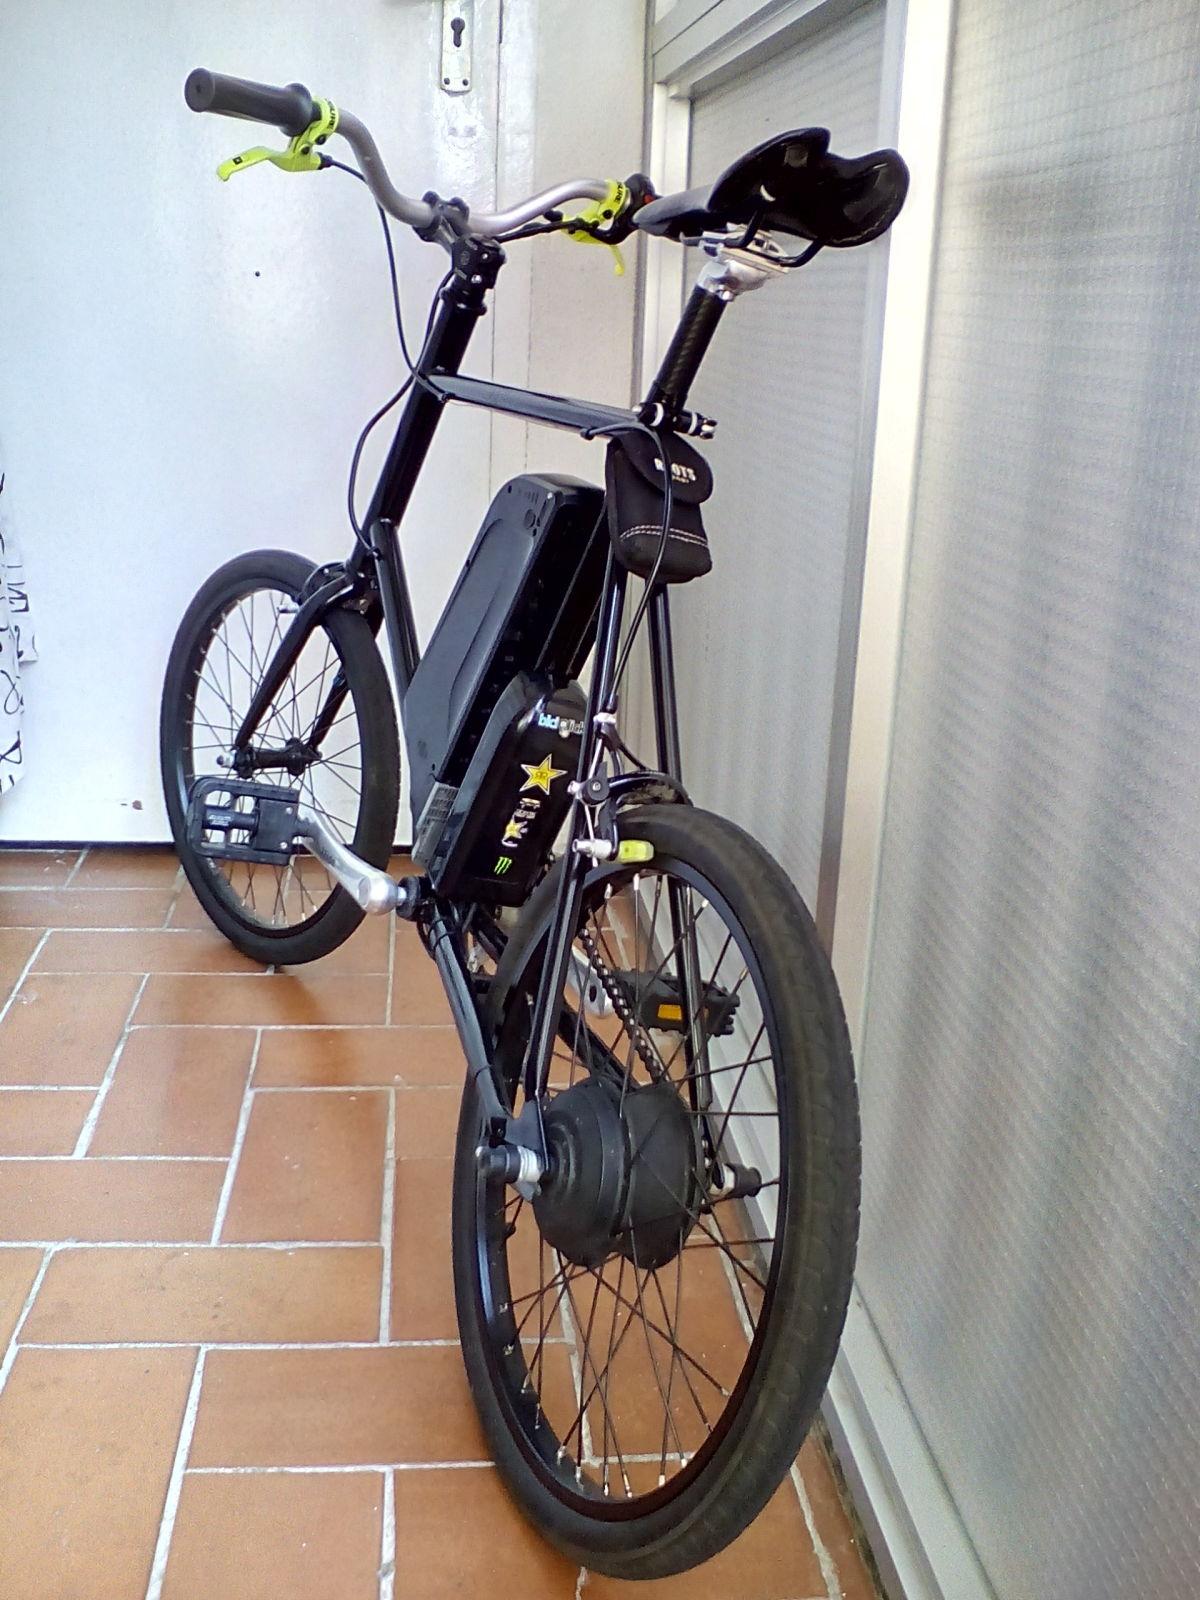 Presenta tu bici eléctrica 5upnpx